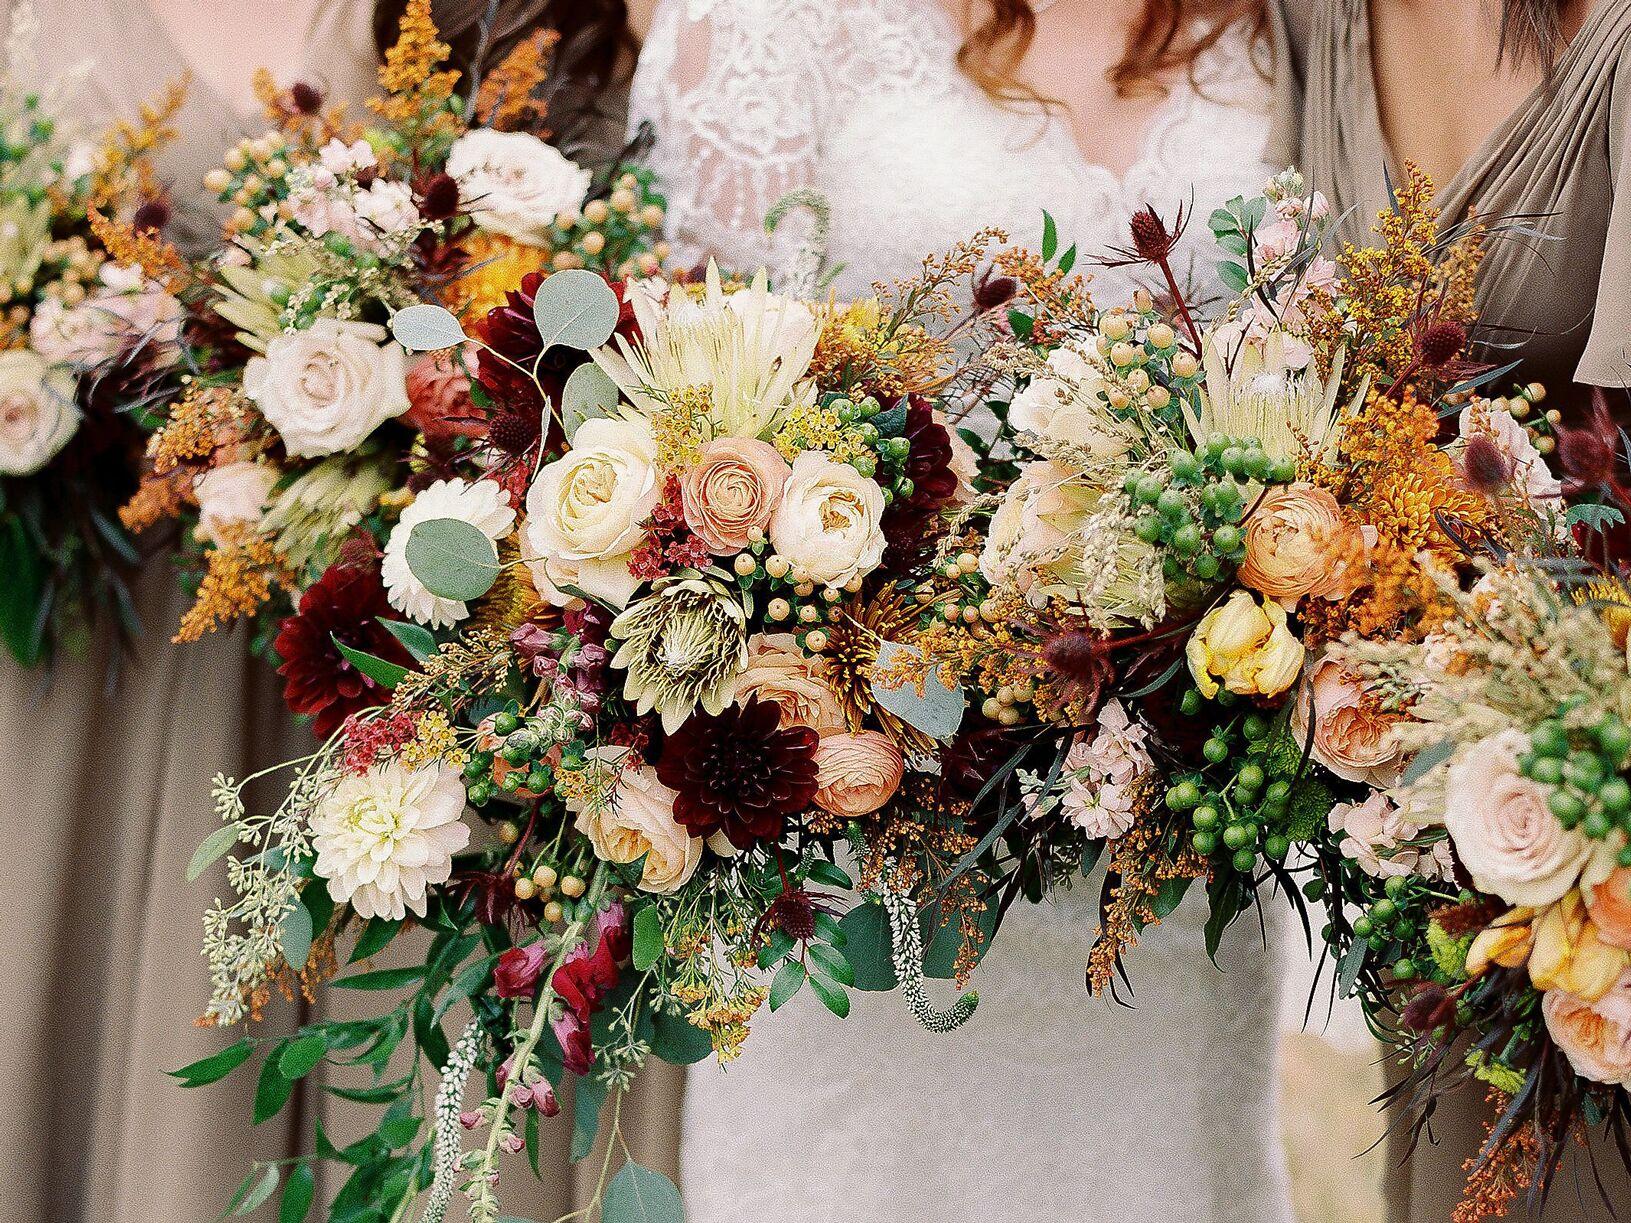 Florist-Terbaik-di-Bandar-Lampung